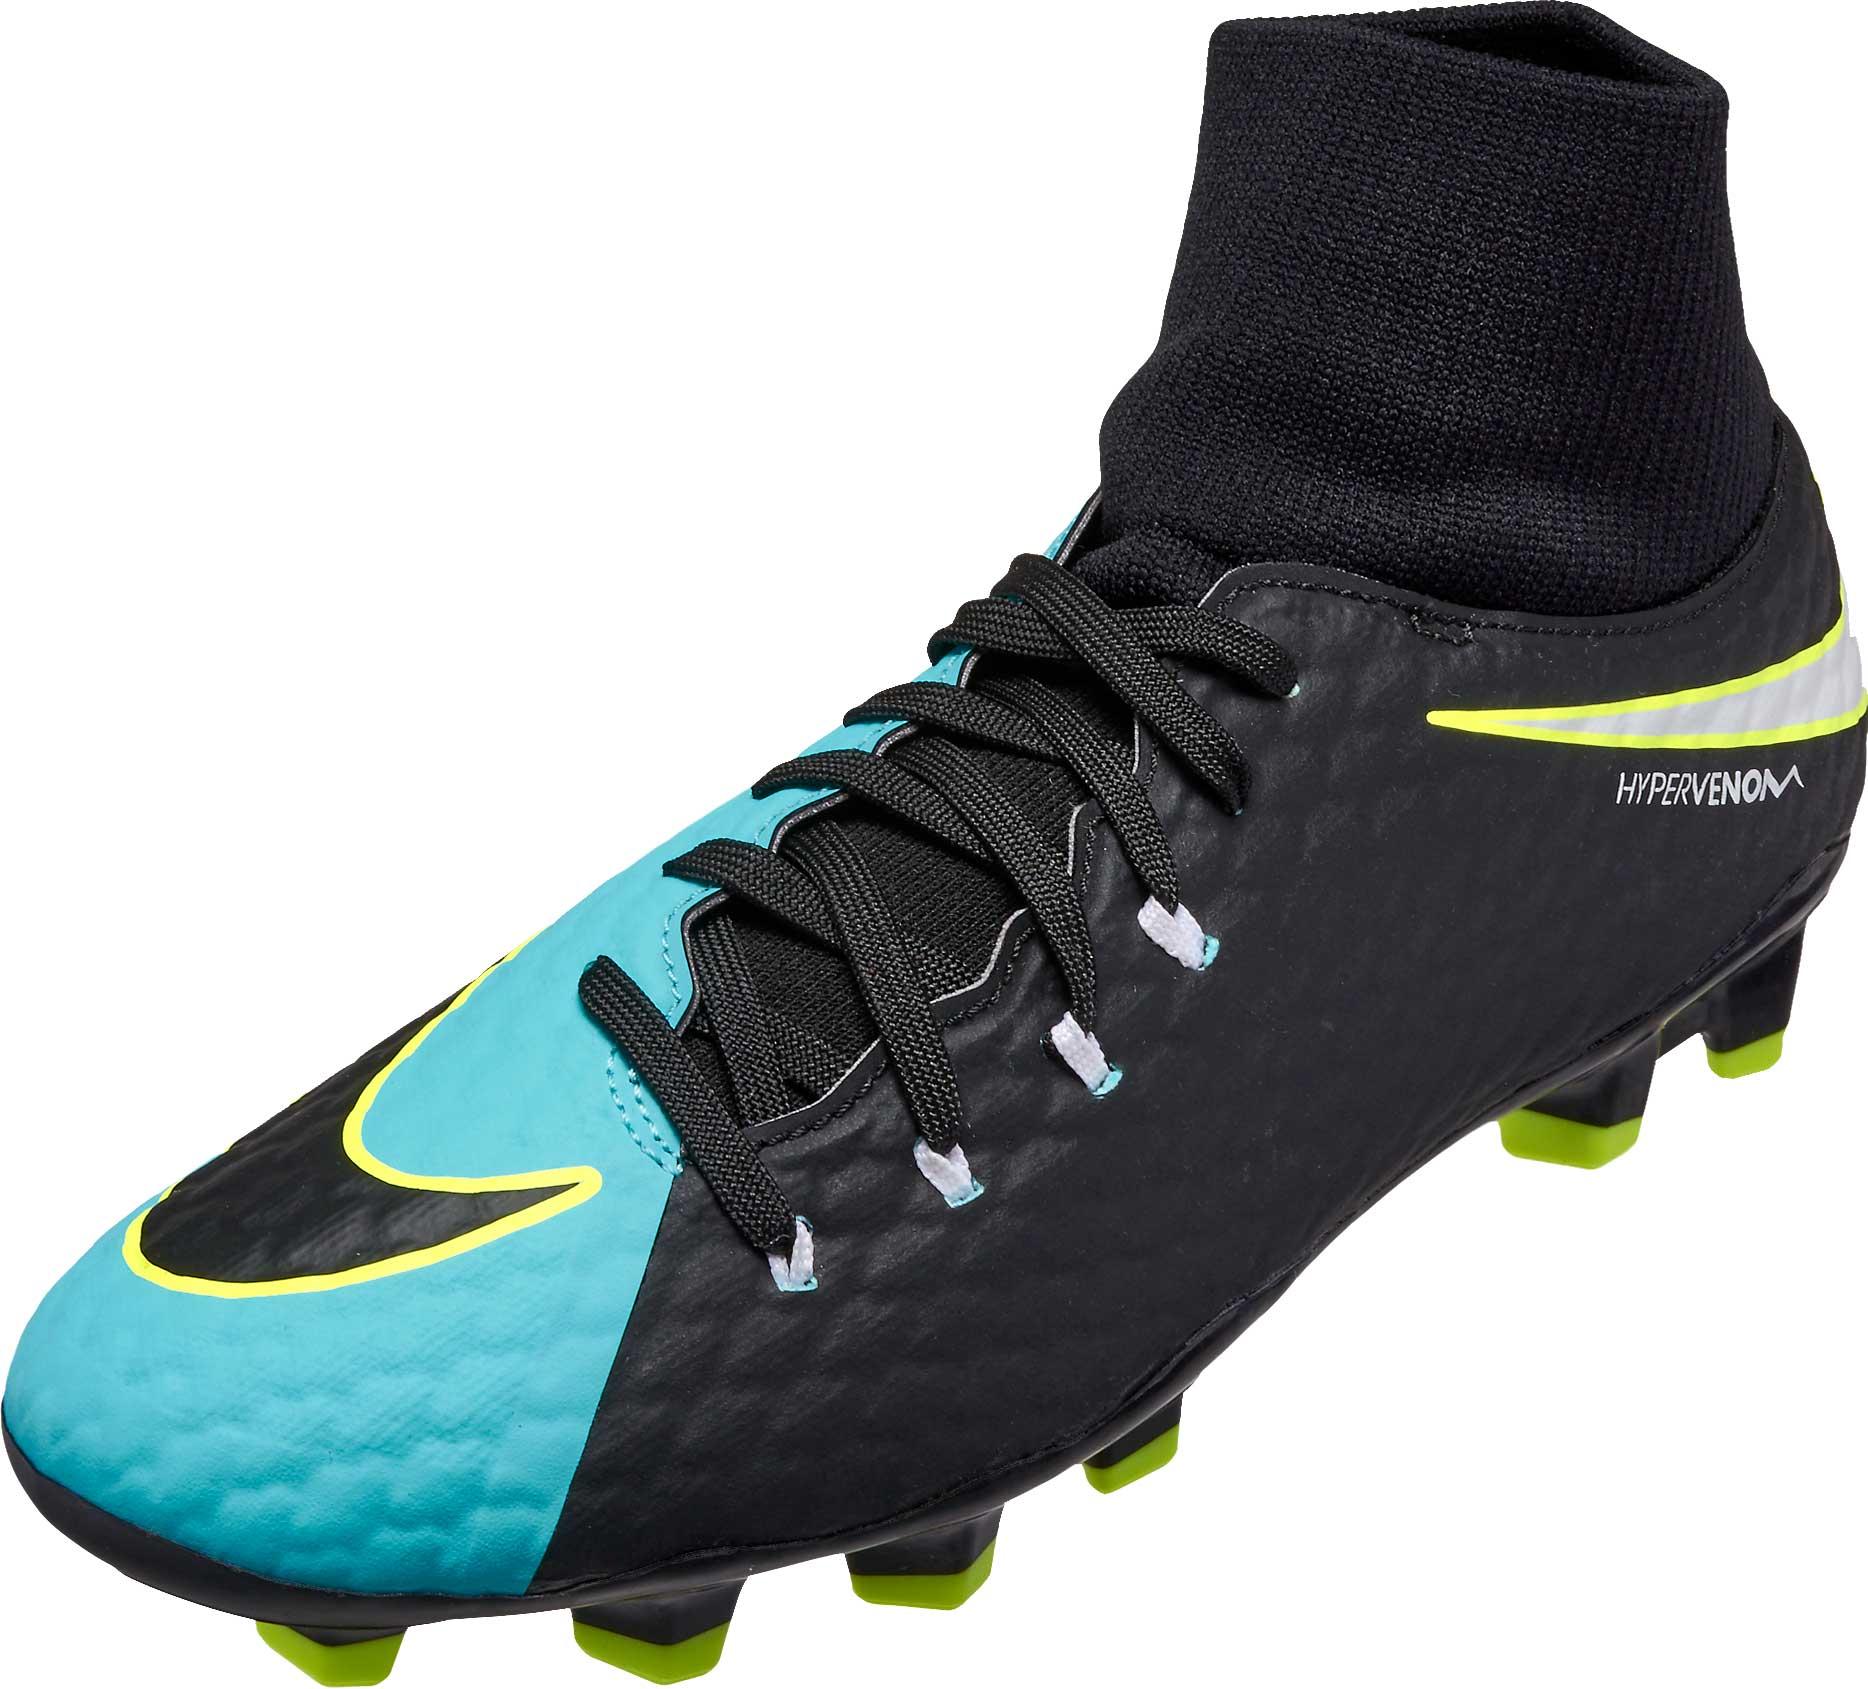 f96828b12 Light Aqua Nike Hypervenom Phelon III DF FG Soccer Shoes - SoccerPro.com